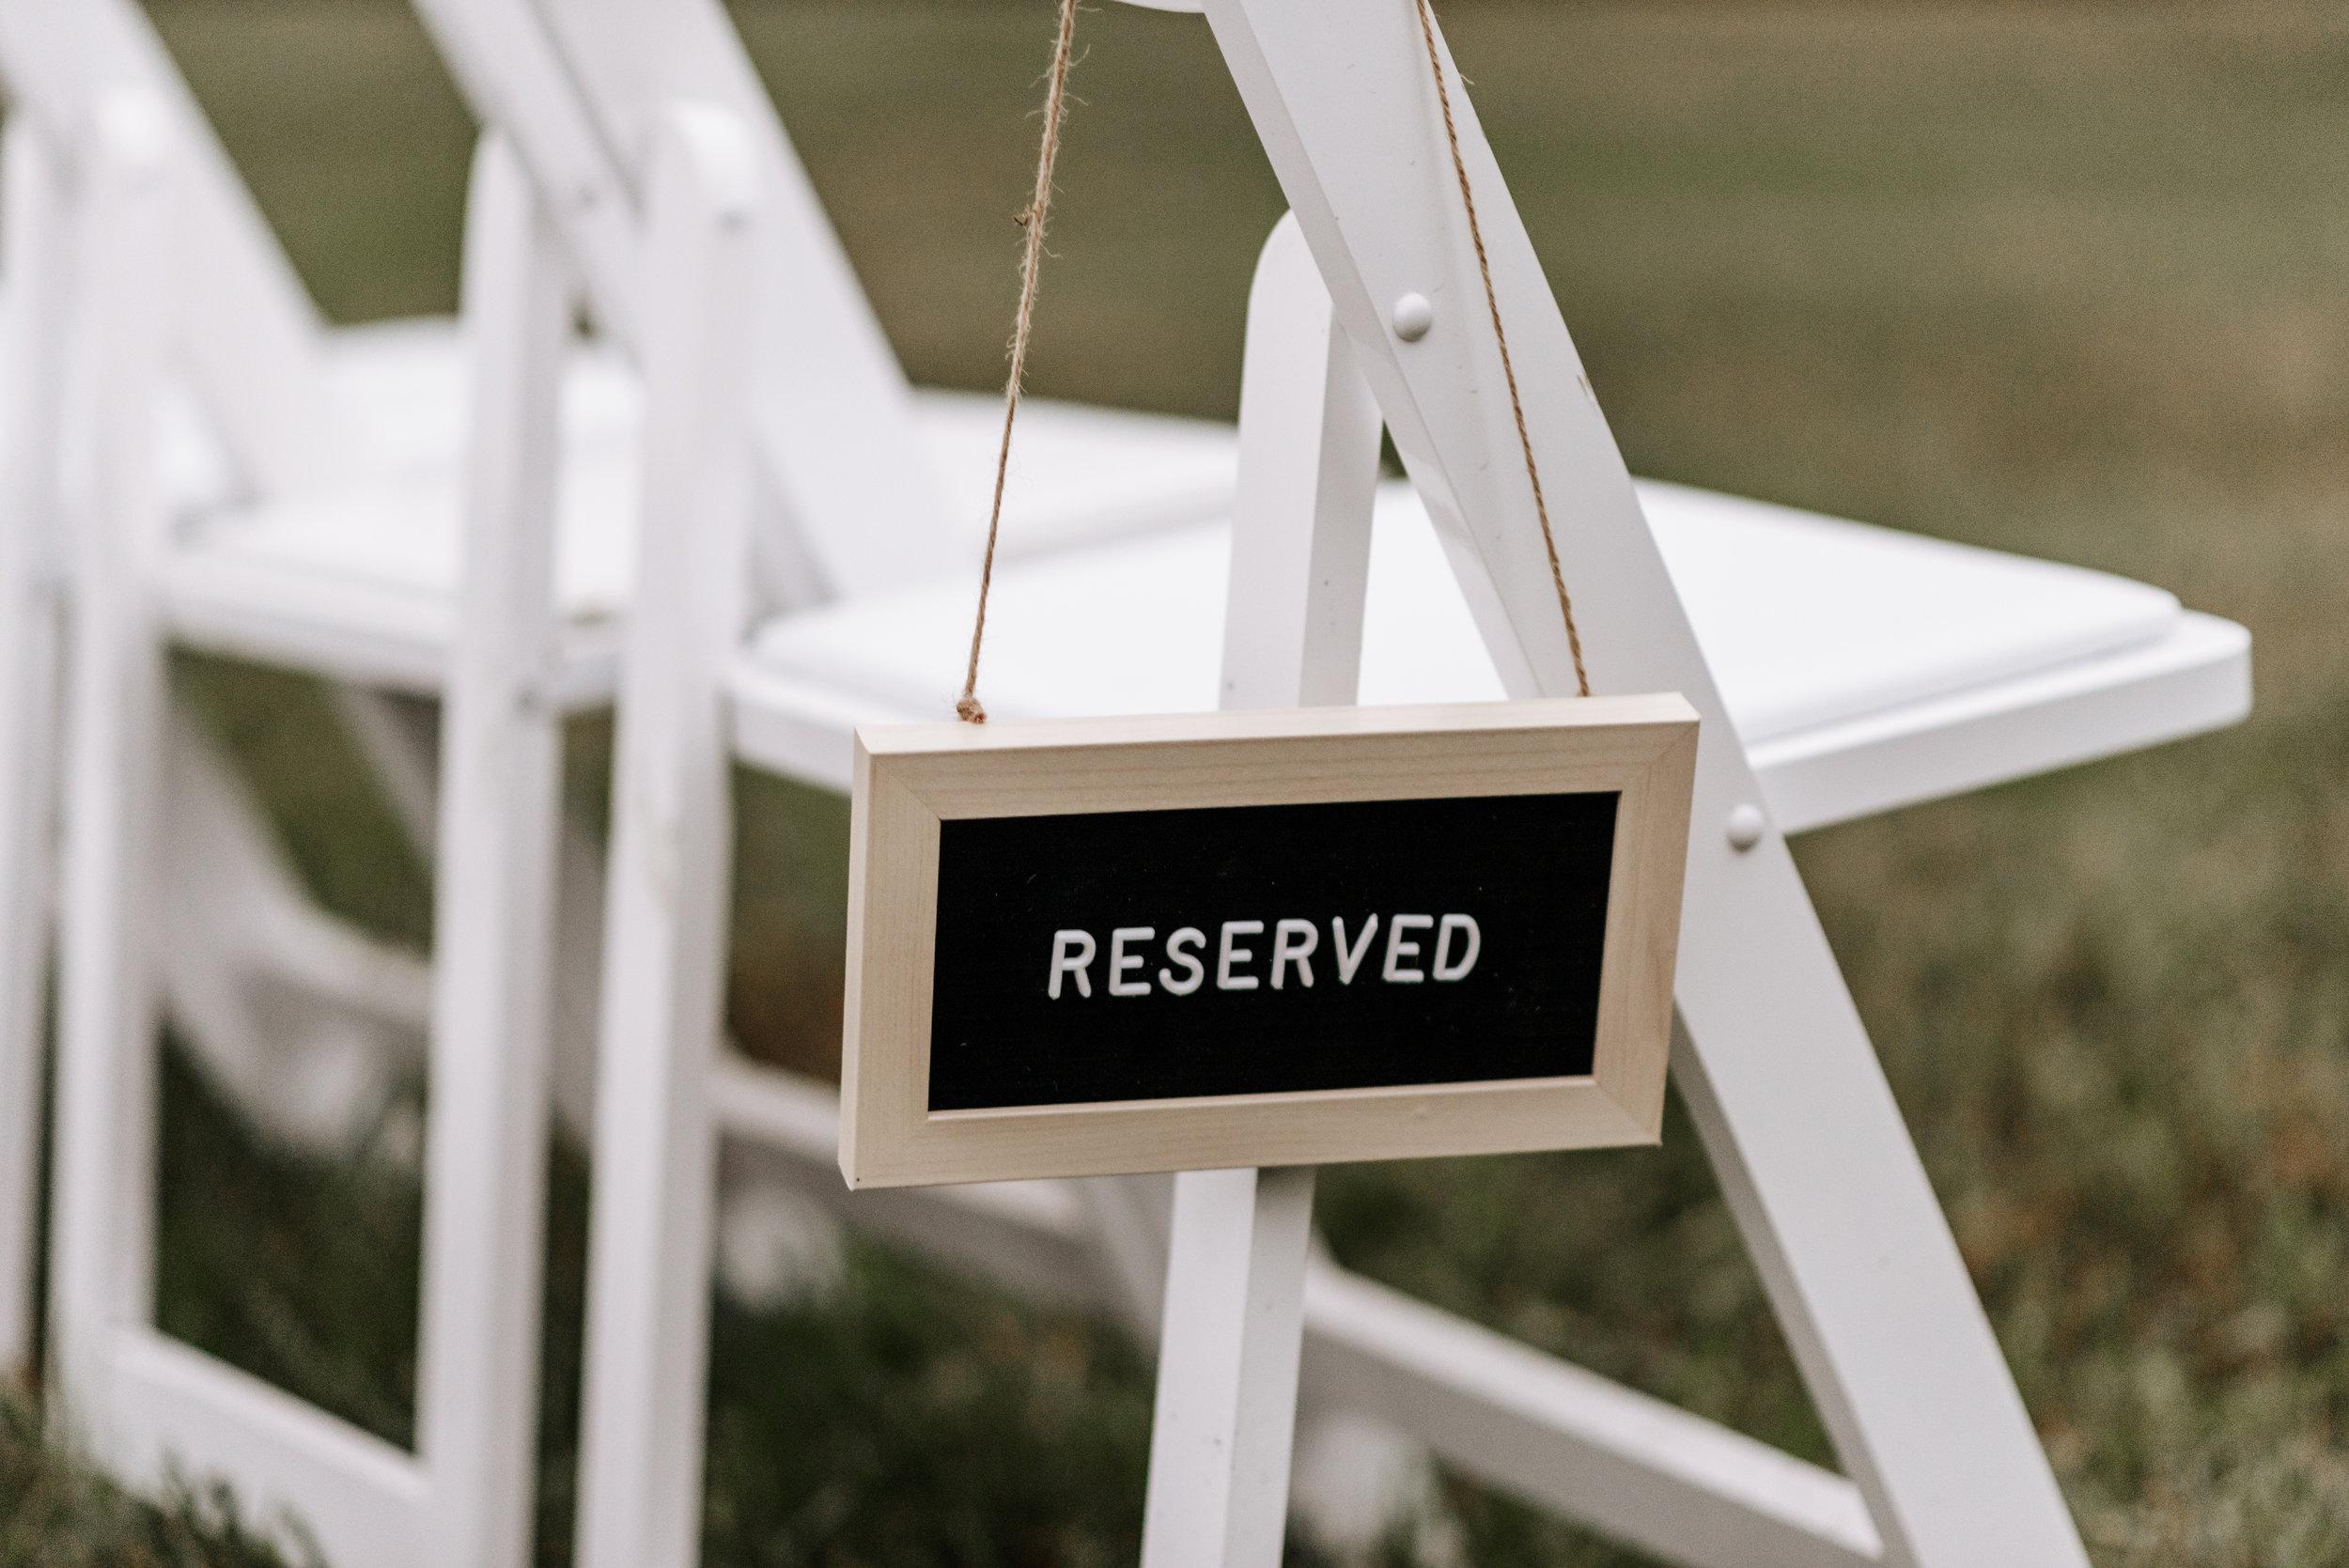 Veritas-Vineyards-and-Winery-Wedding-Photography-Afton-Virginia-Yasmin-Seth-Photography-by-V-2951.jpg